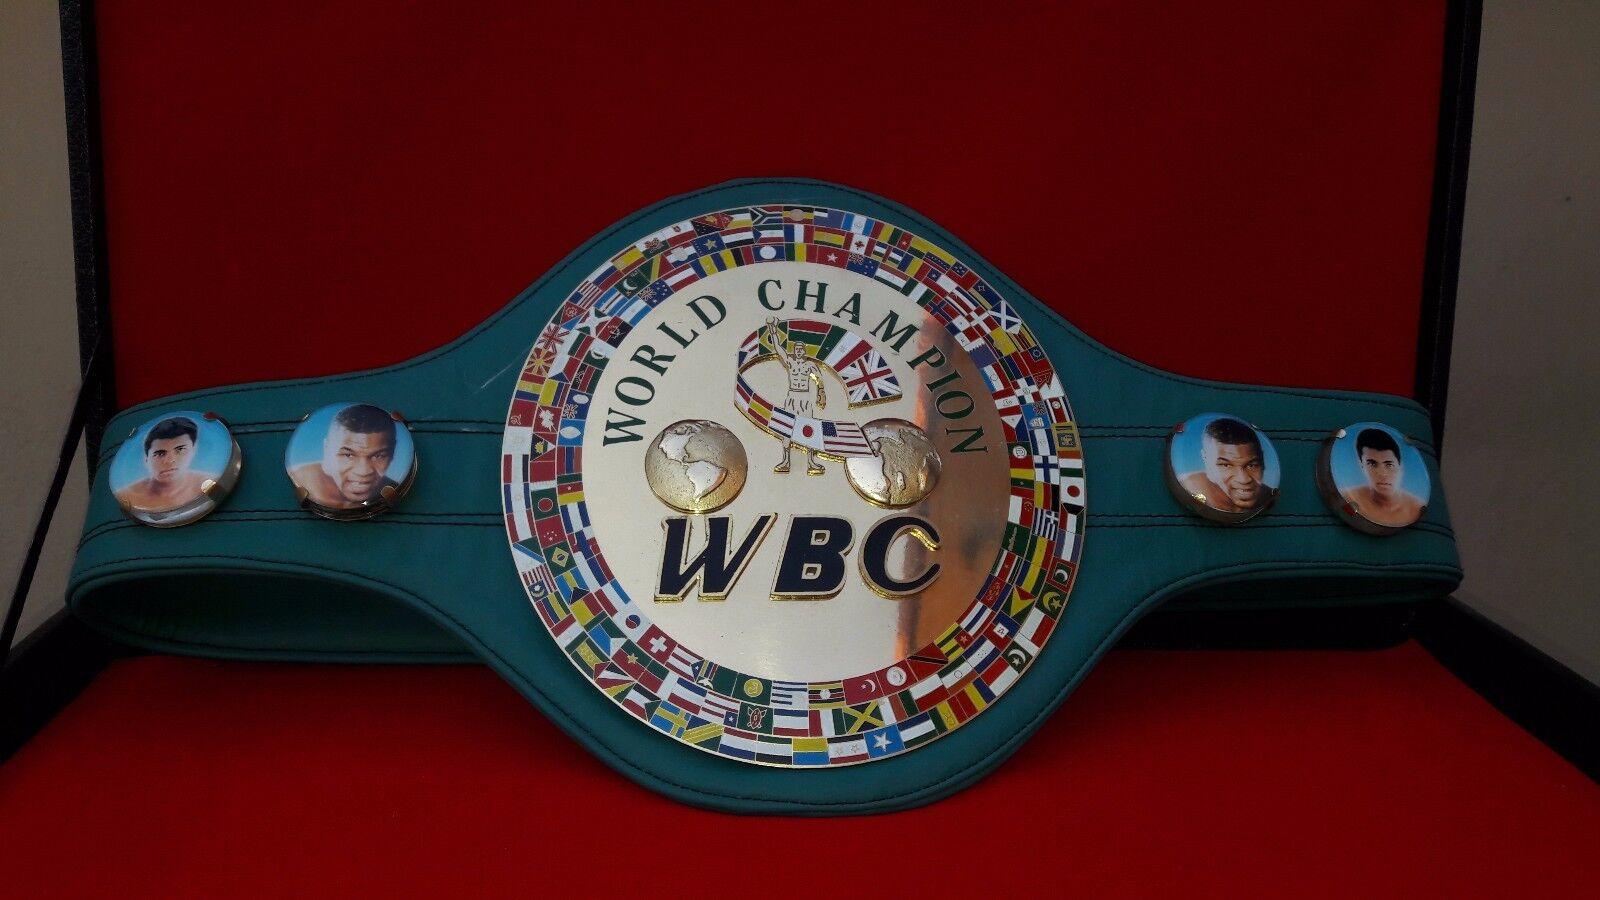 WBC Boxing Champion Ship Belt .Adult size  without case